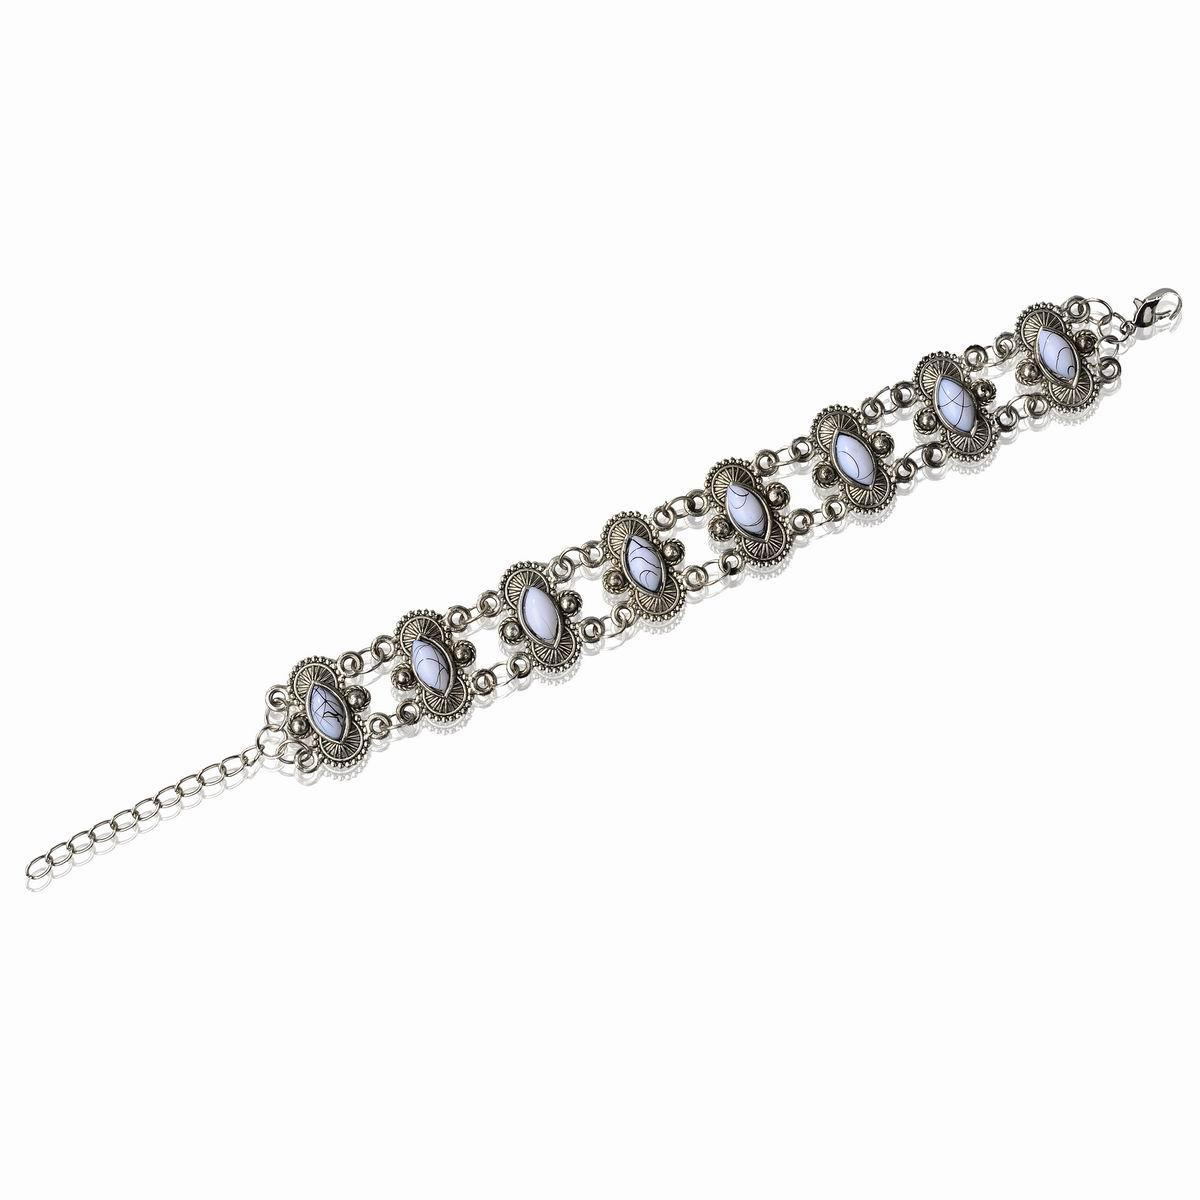 Vintage Carved Link Chain Bracelet Acrylic Gift Bangle Gift Retro New Fashion